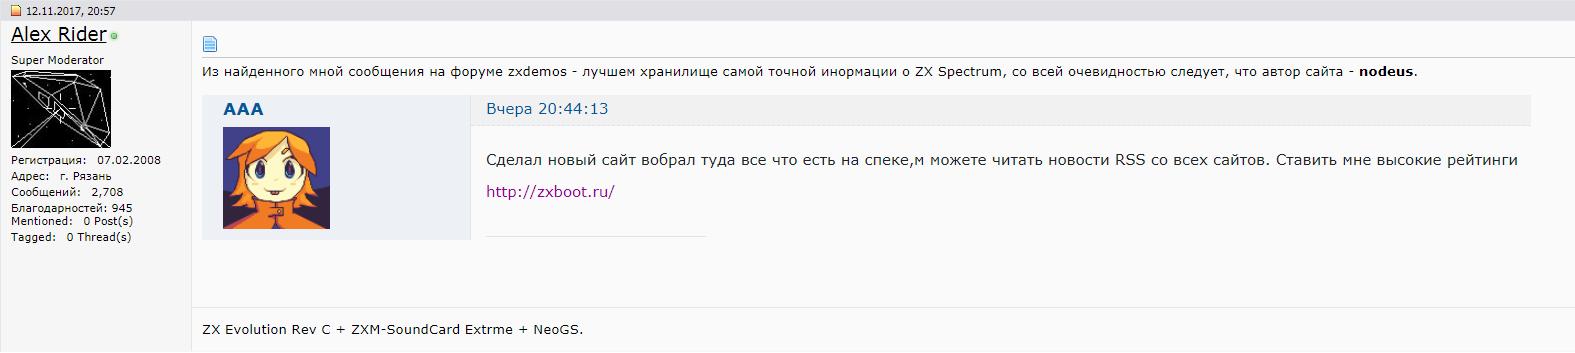 https://zxdemos.ru/uploads/images/2/89e71dca40b8d7633cc747e6bd747ea6.png